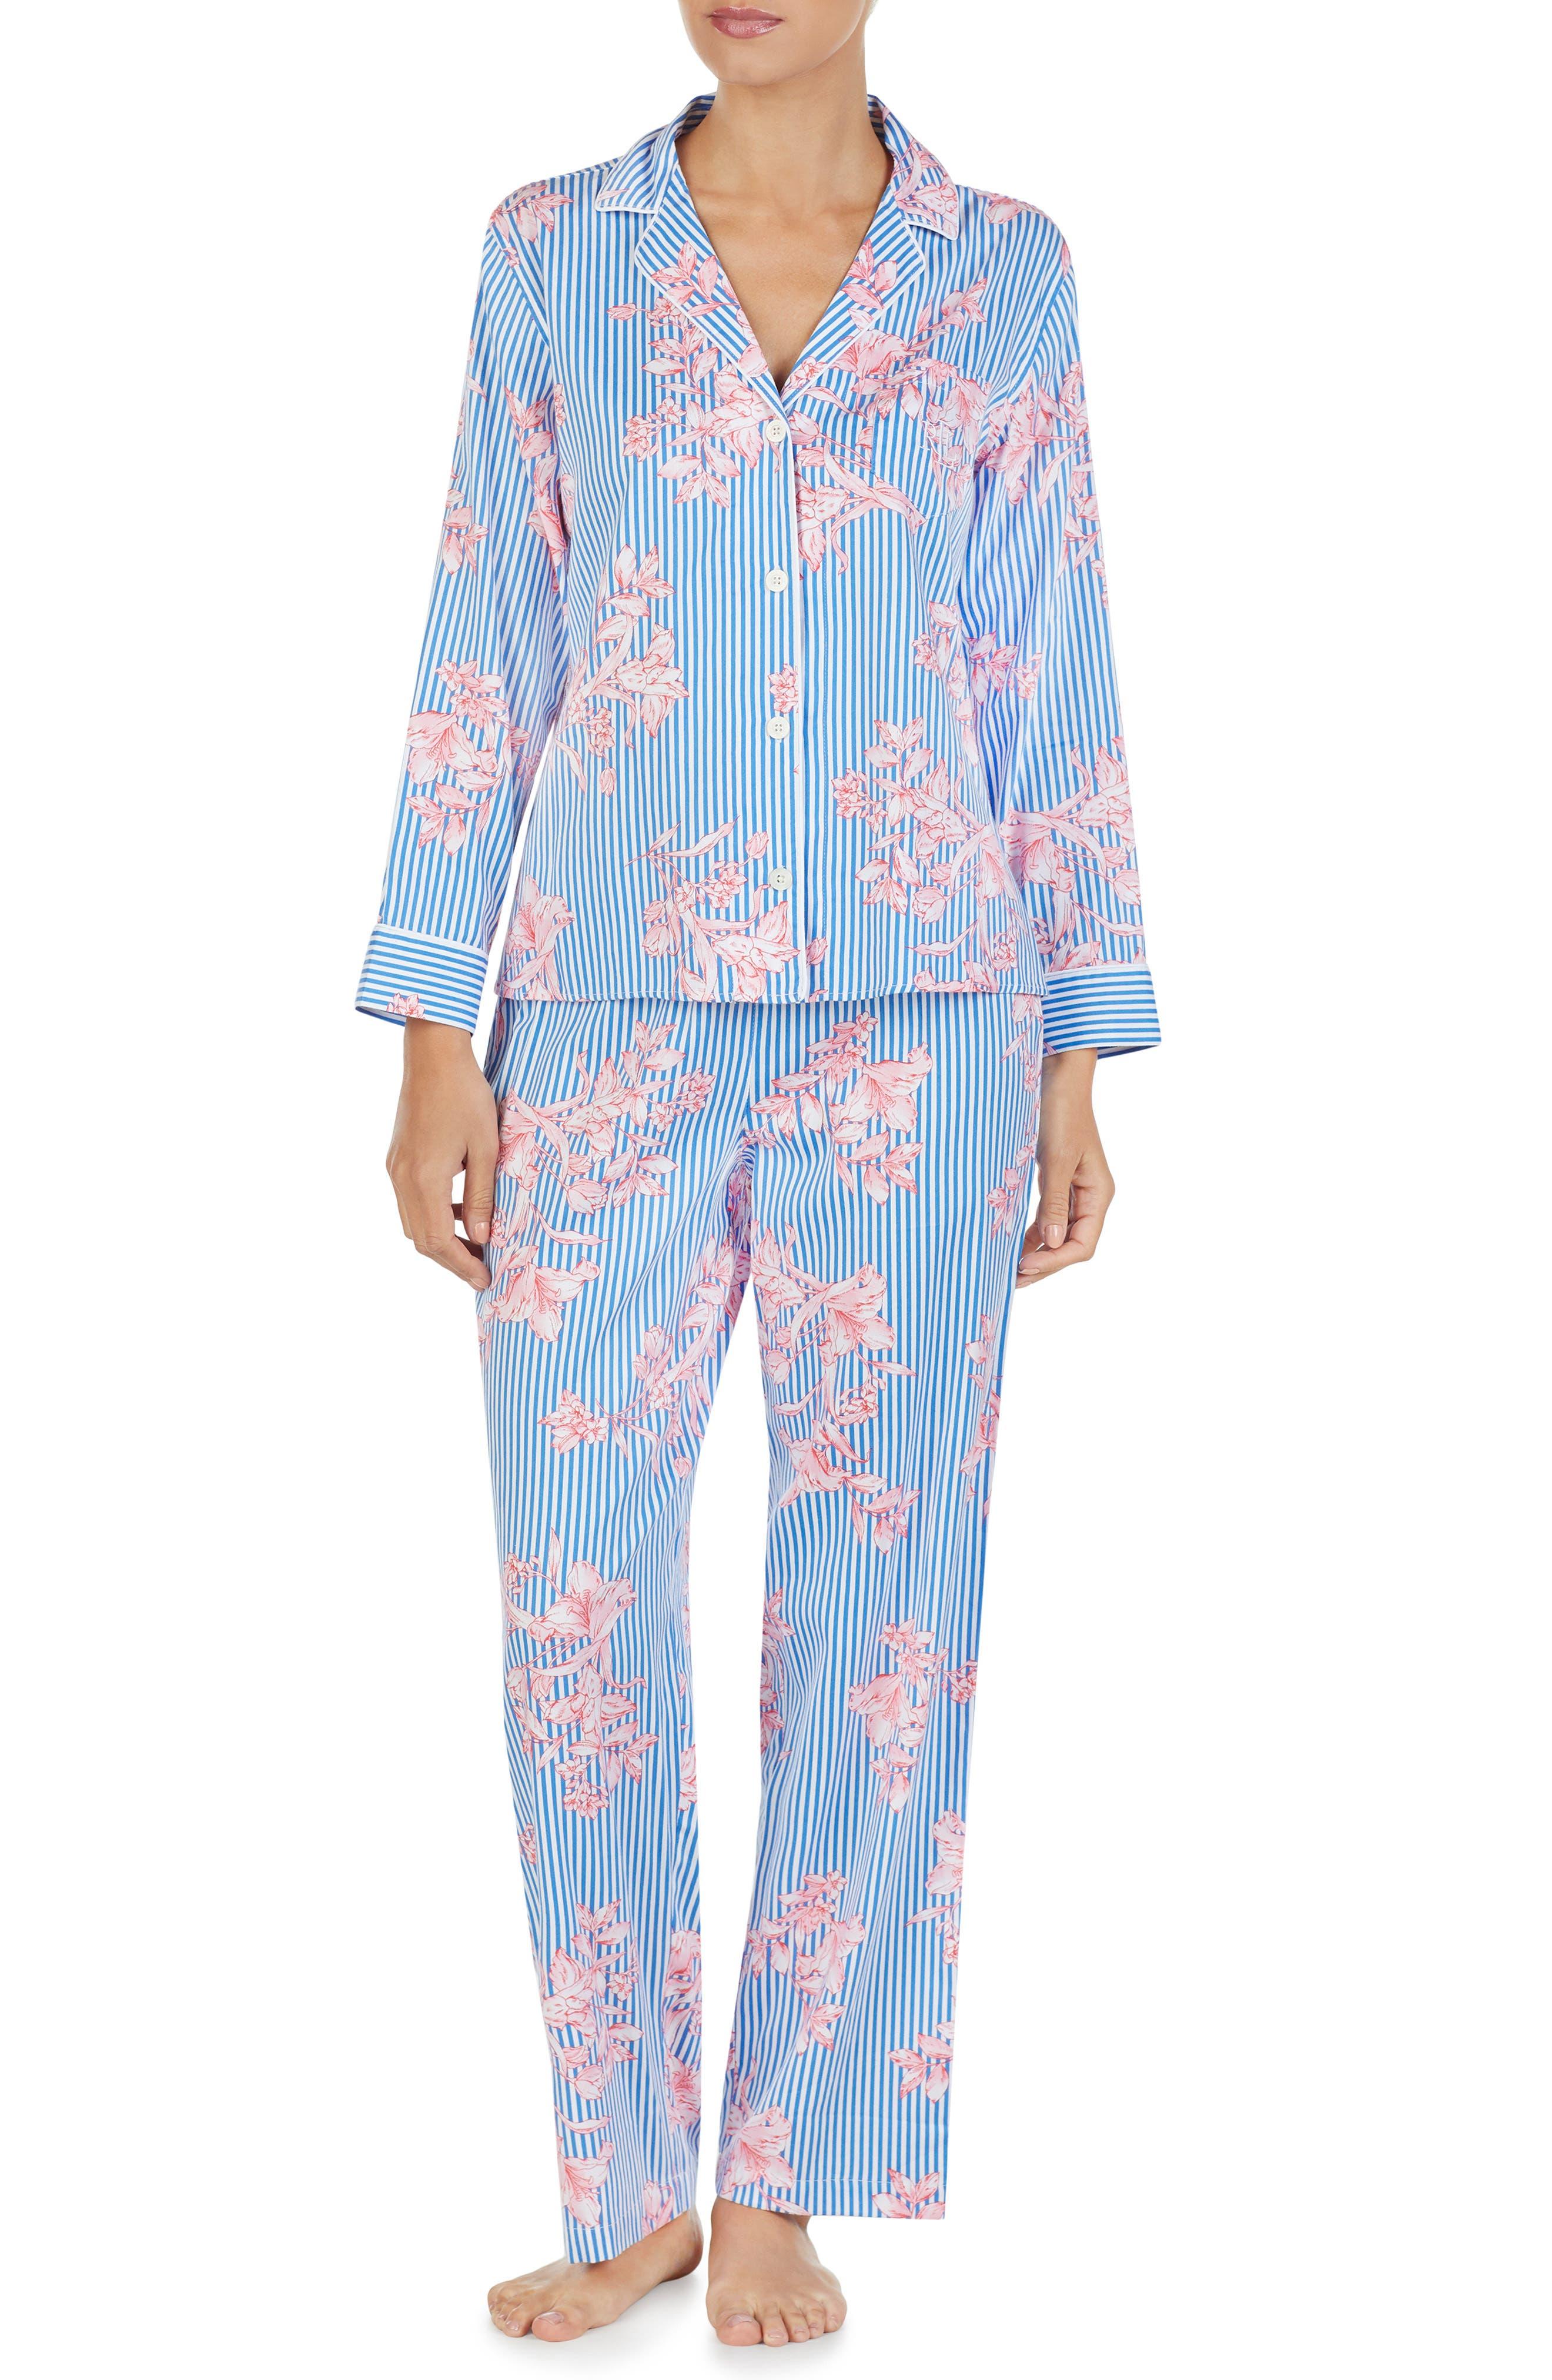 LAUREN RALPH LAUREN Floral Pajamas, Main, color, 486